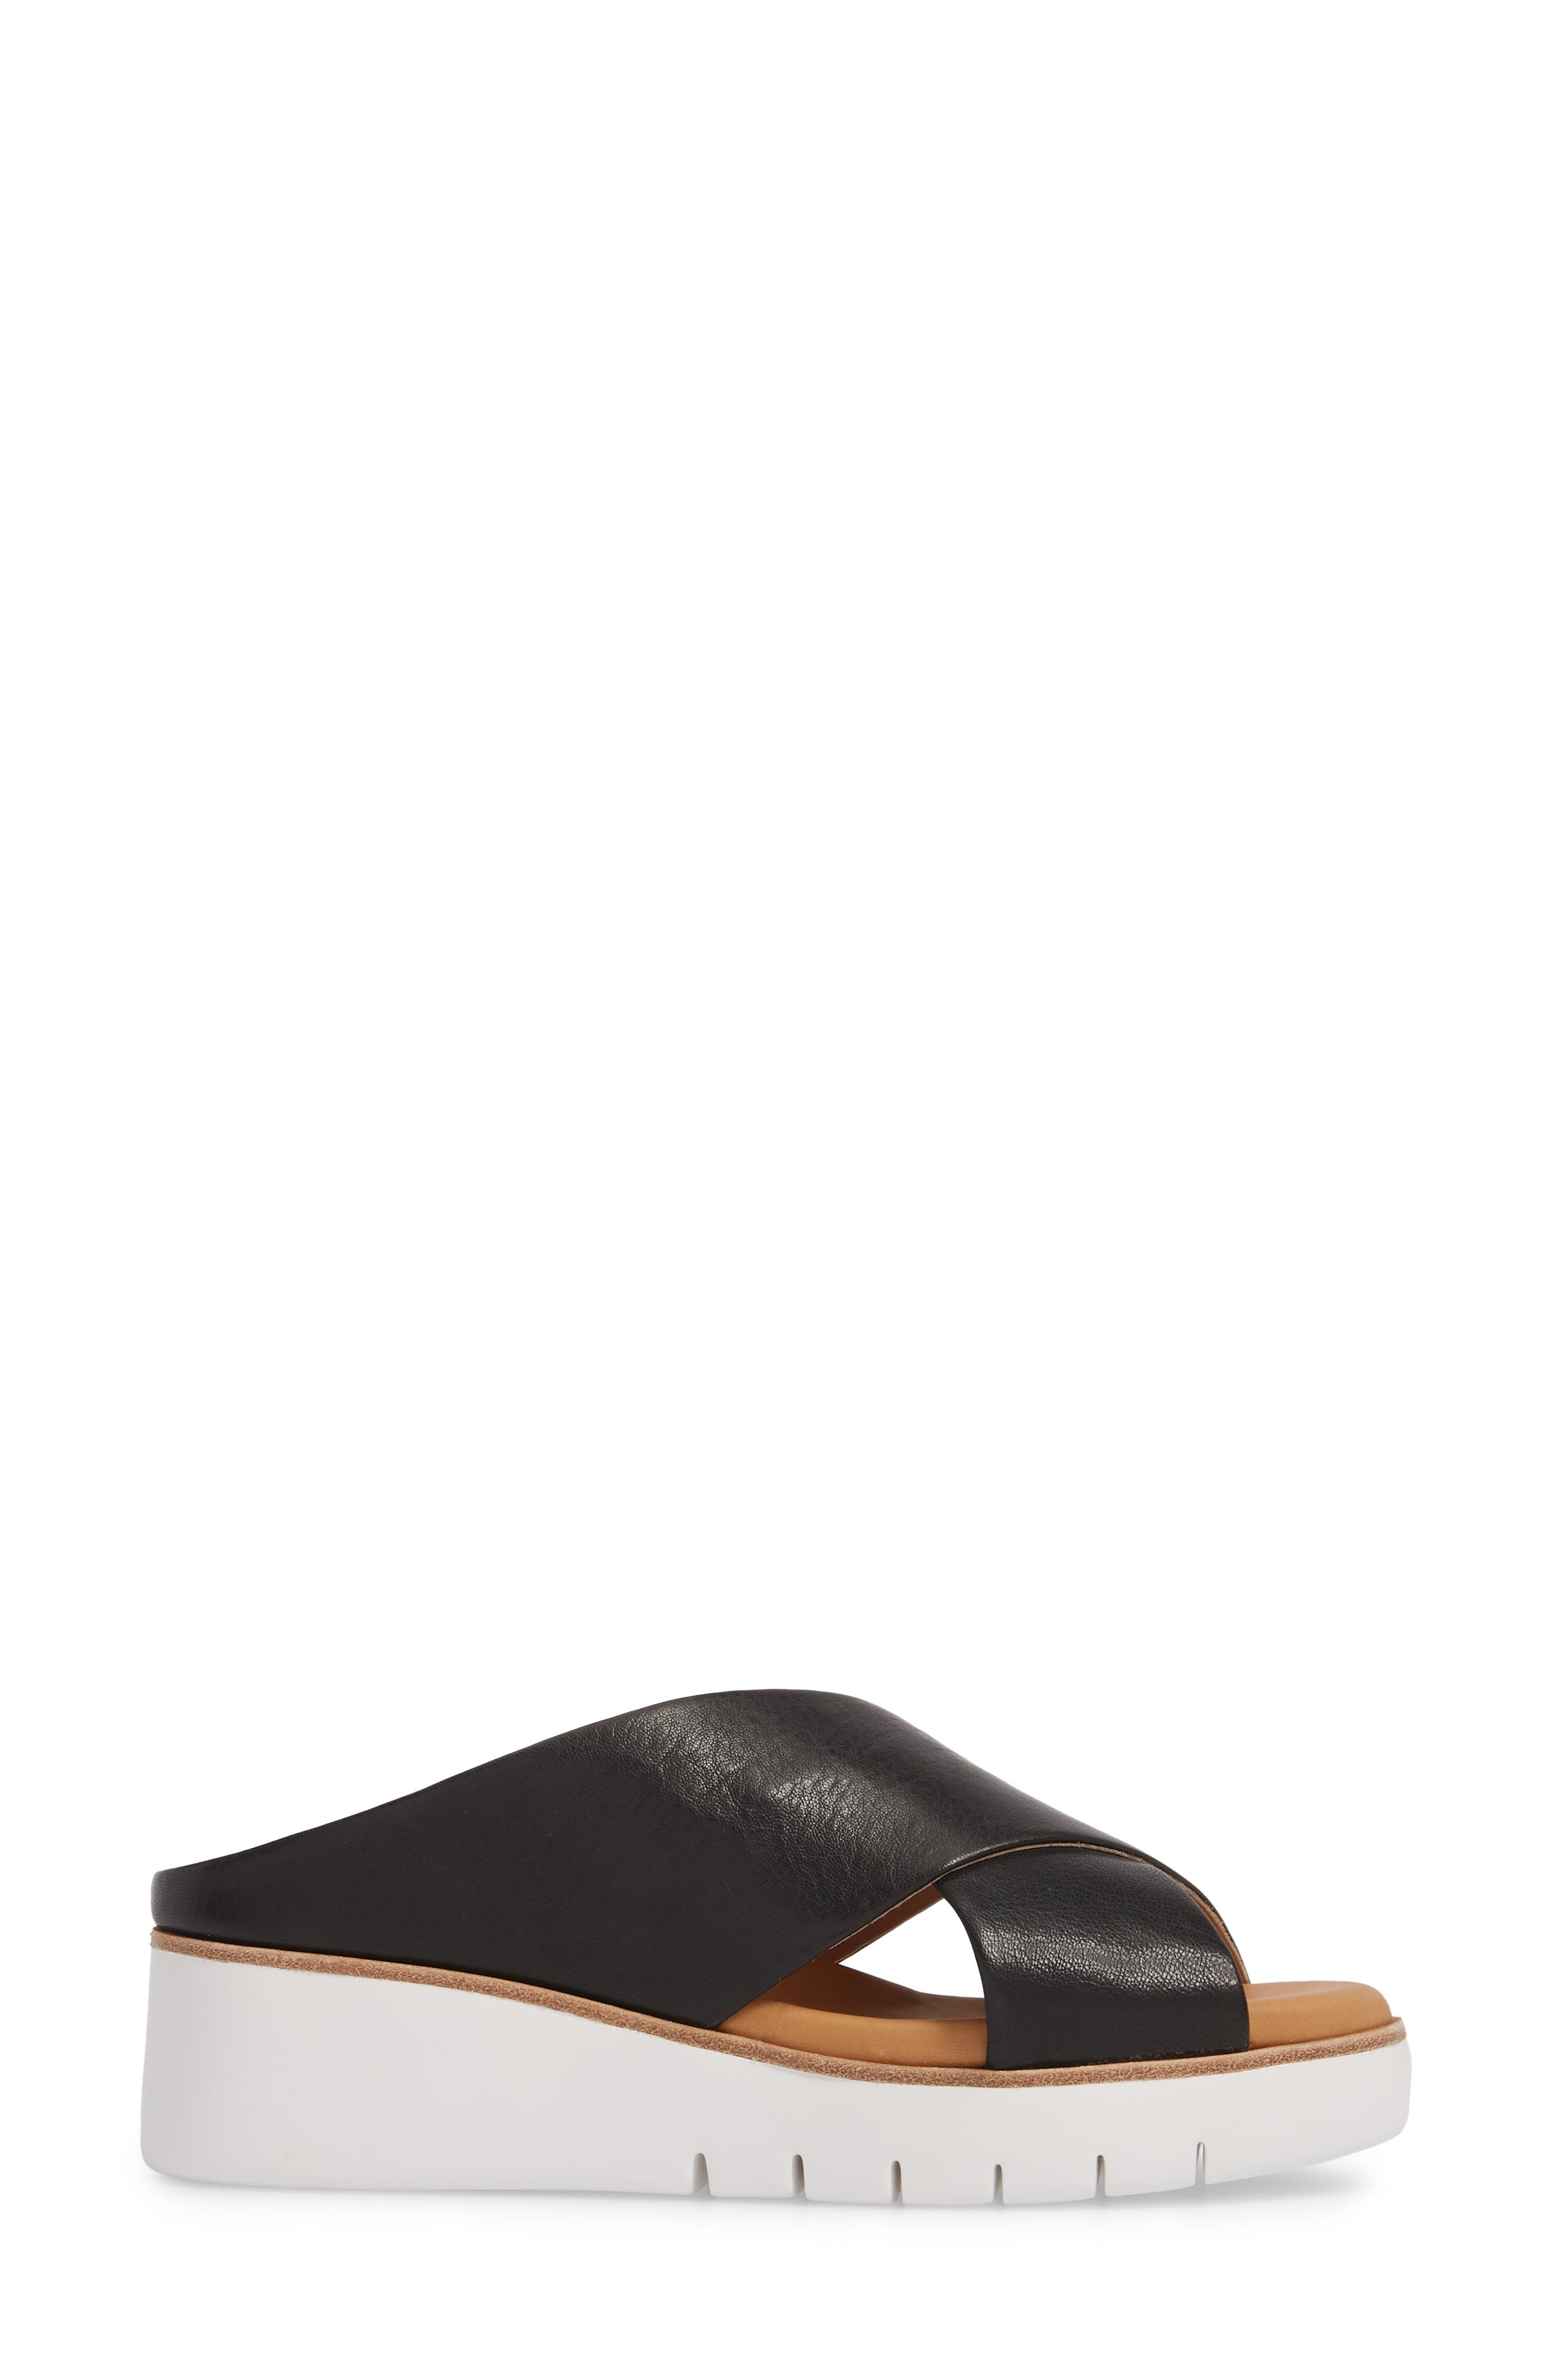 Brunna Sandal,                             Alternate thumbnail 3, color,                             Black Leather